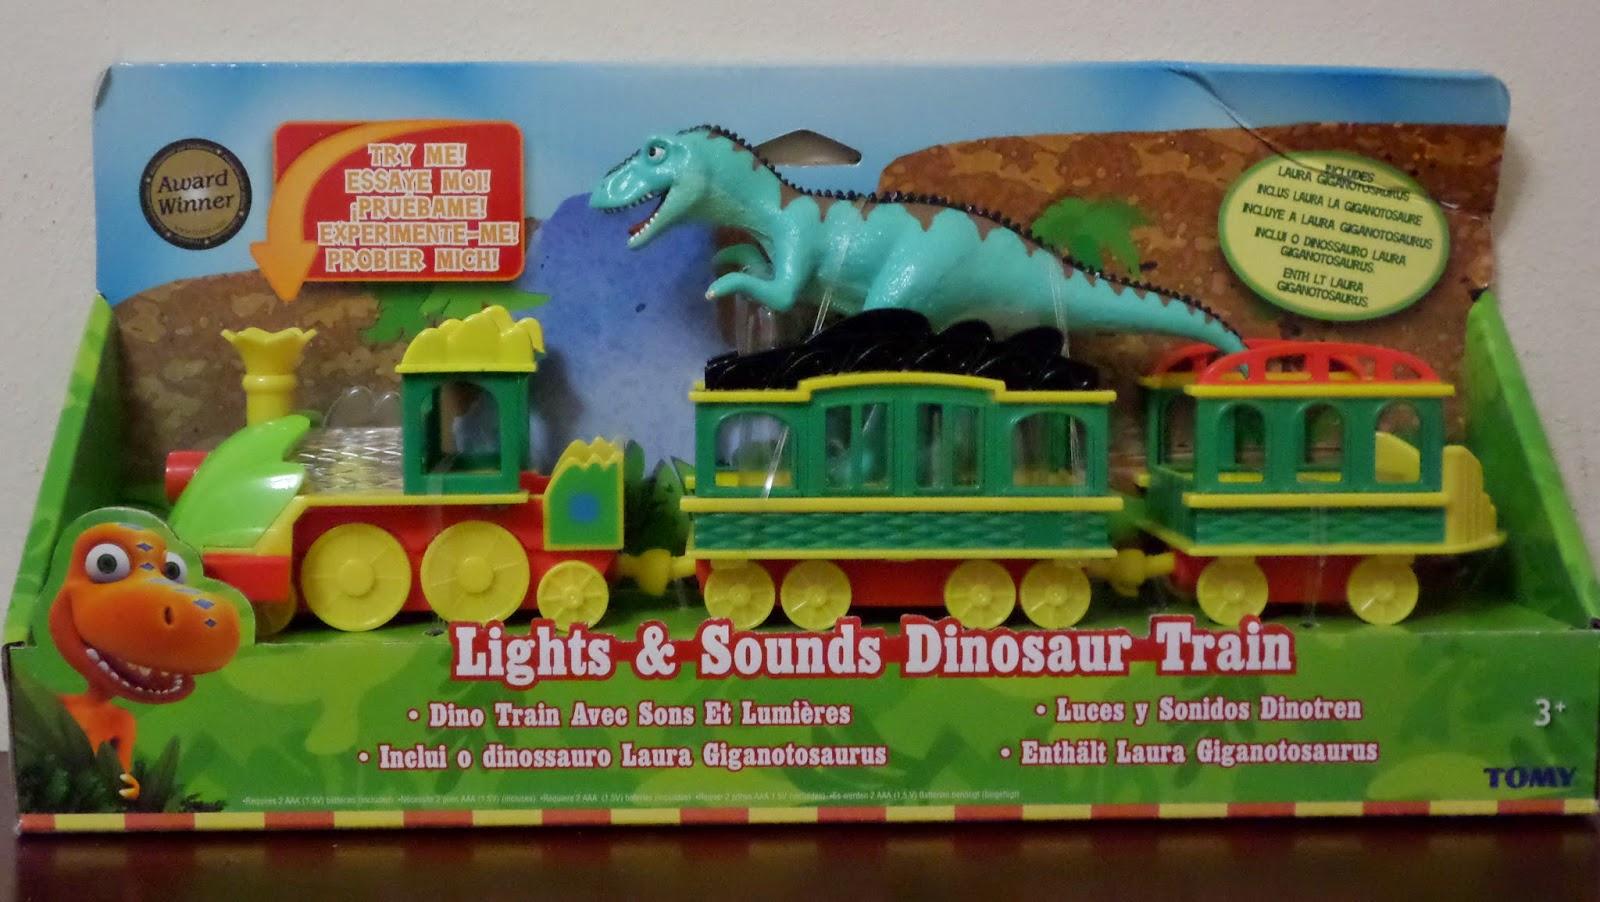 Dinosaur Train Lights And Sounds